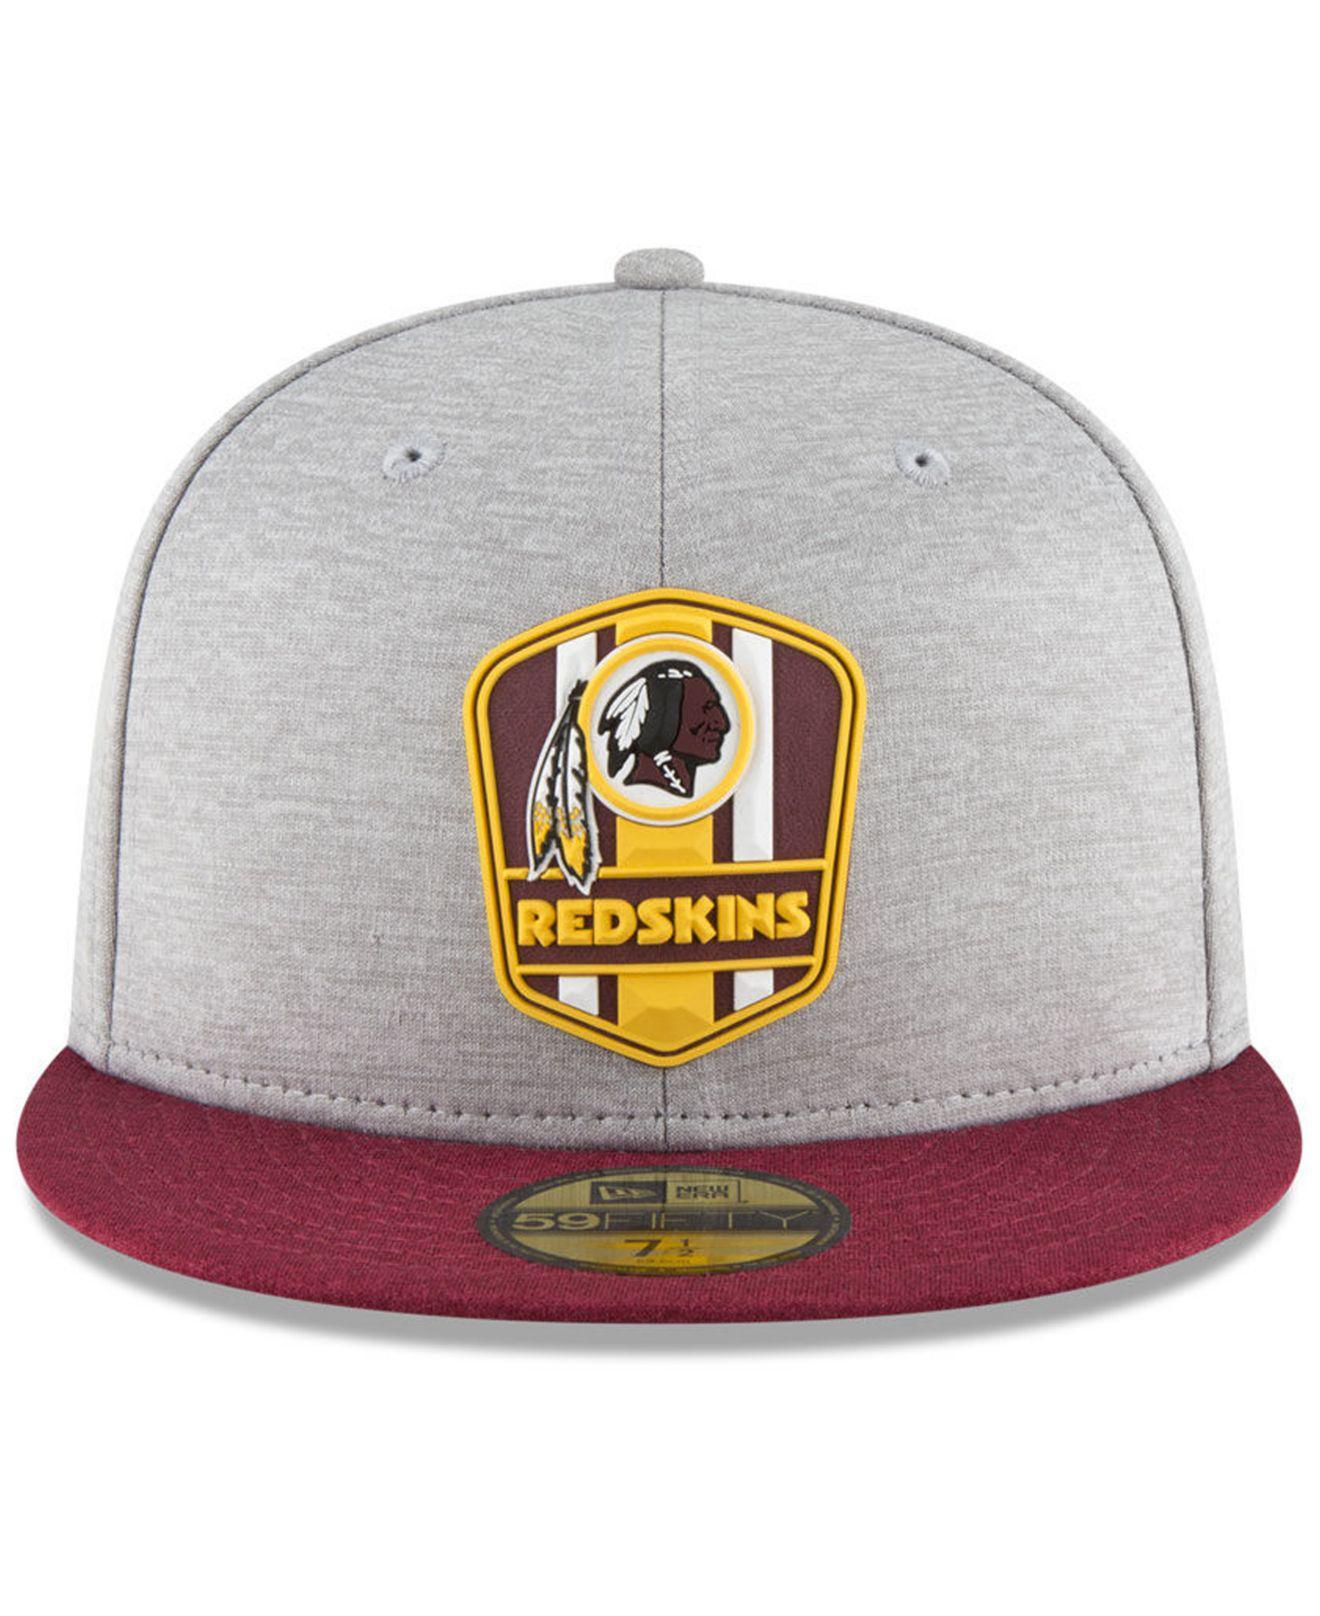 online retailer 69914 2b538 Lyst - KTZ Washington Redskins On Field Sideline Road 59fifty Fitted Cap in  Gray for Men